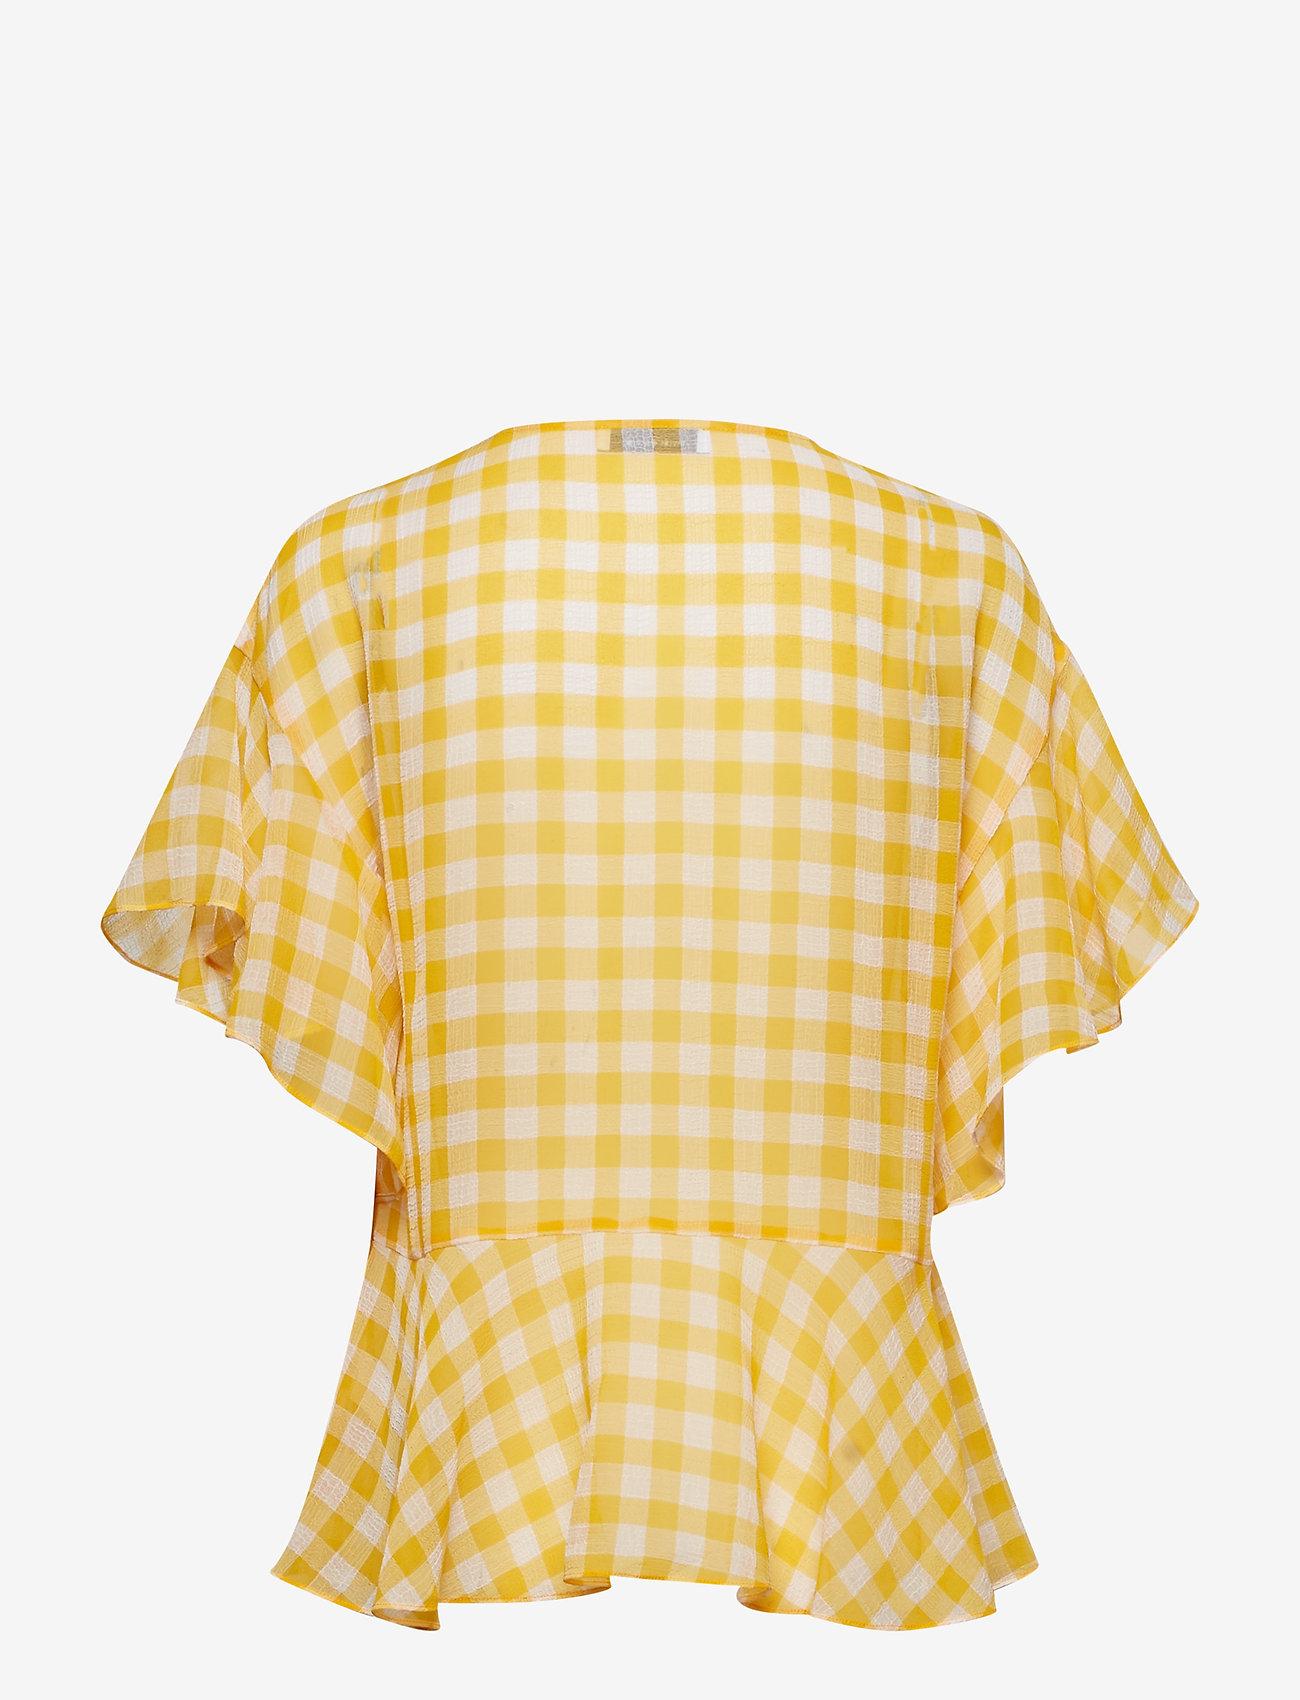 Samsøe Samsøe Cherie ss 10841 - Blouses & Shirts ARTISANS GOLD CH.